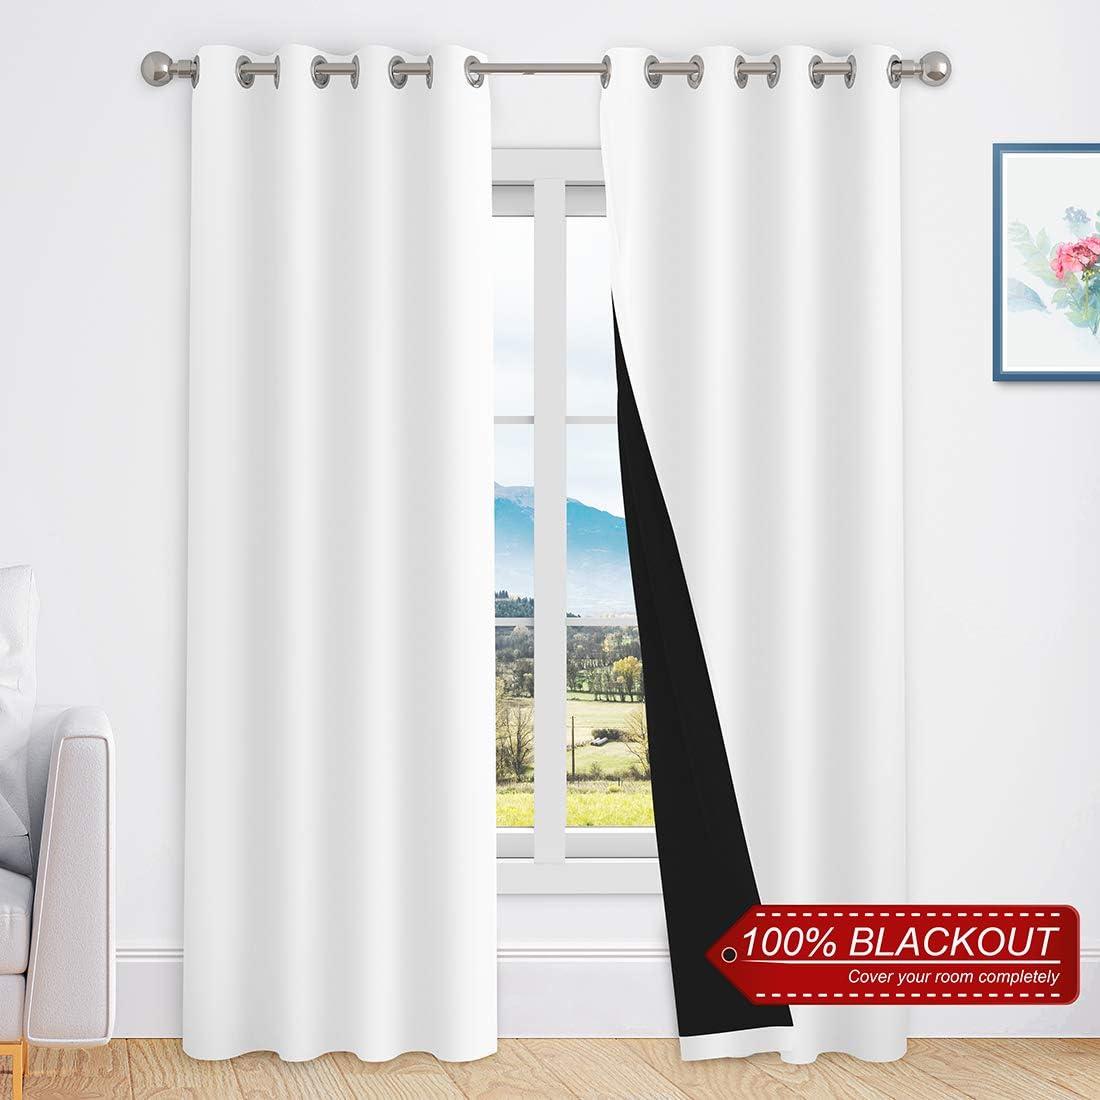 YUDSUD Full Blackout Curtain Panels for Bedroom,livingroom,Infant Room,100 Shading Drapes,Privacy Protection Noise Reducing,Full Light Blocking Panels,2 Panels 52 W x 72 L, White